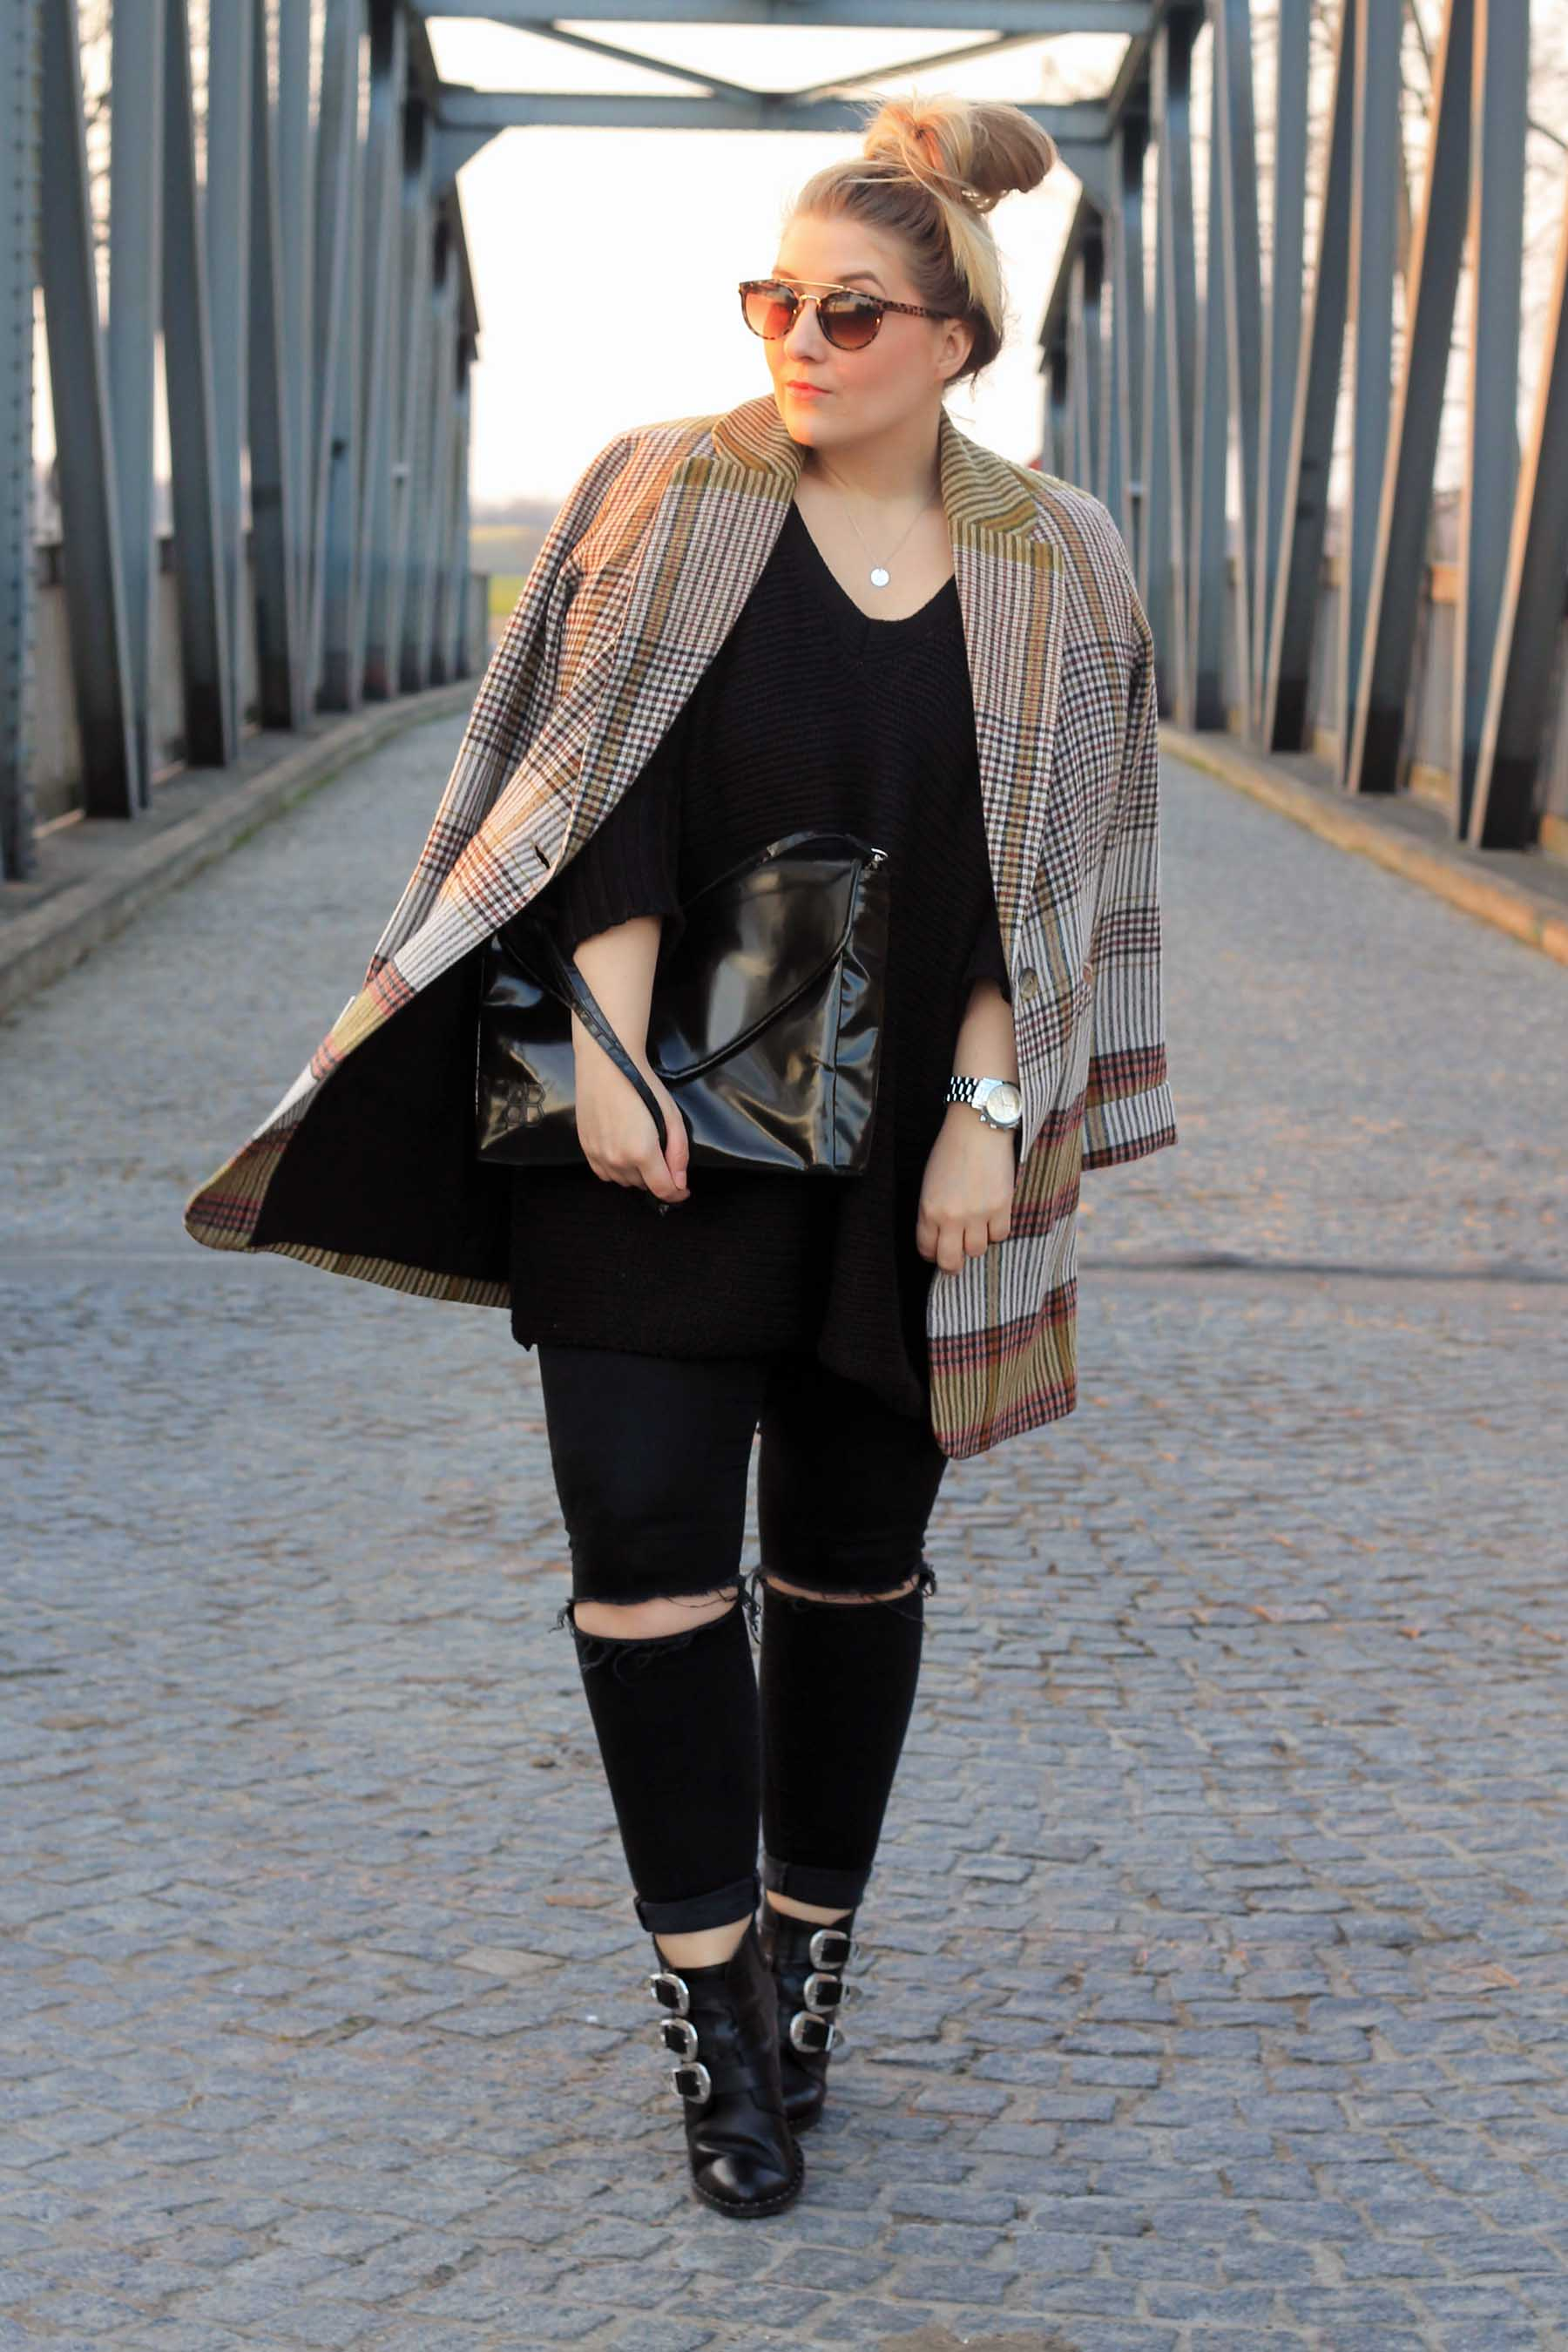 1-outfit-modeblog-fashionblog-stiefeletten-asos-karierter-mantel-berln